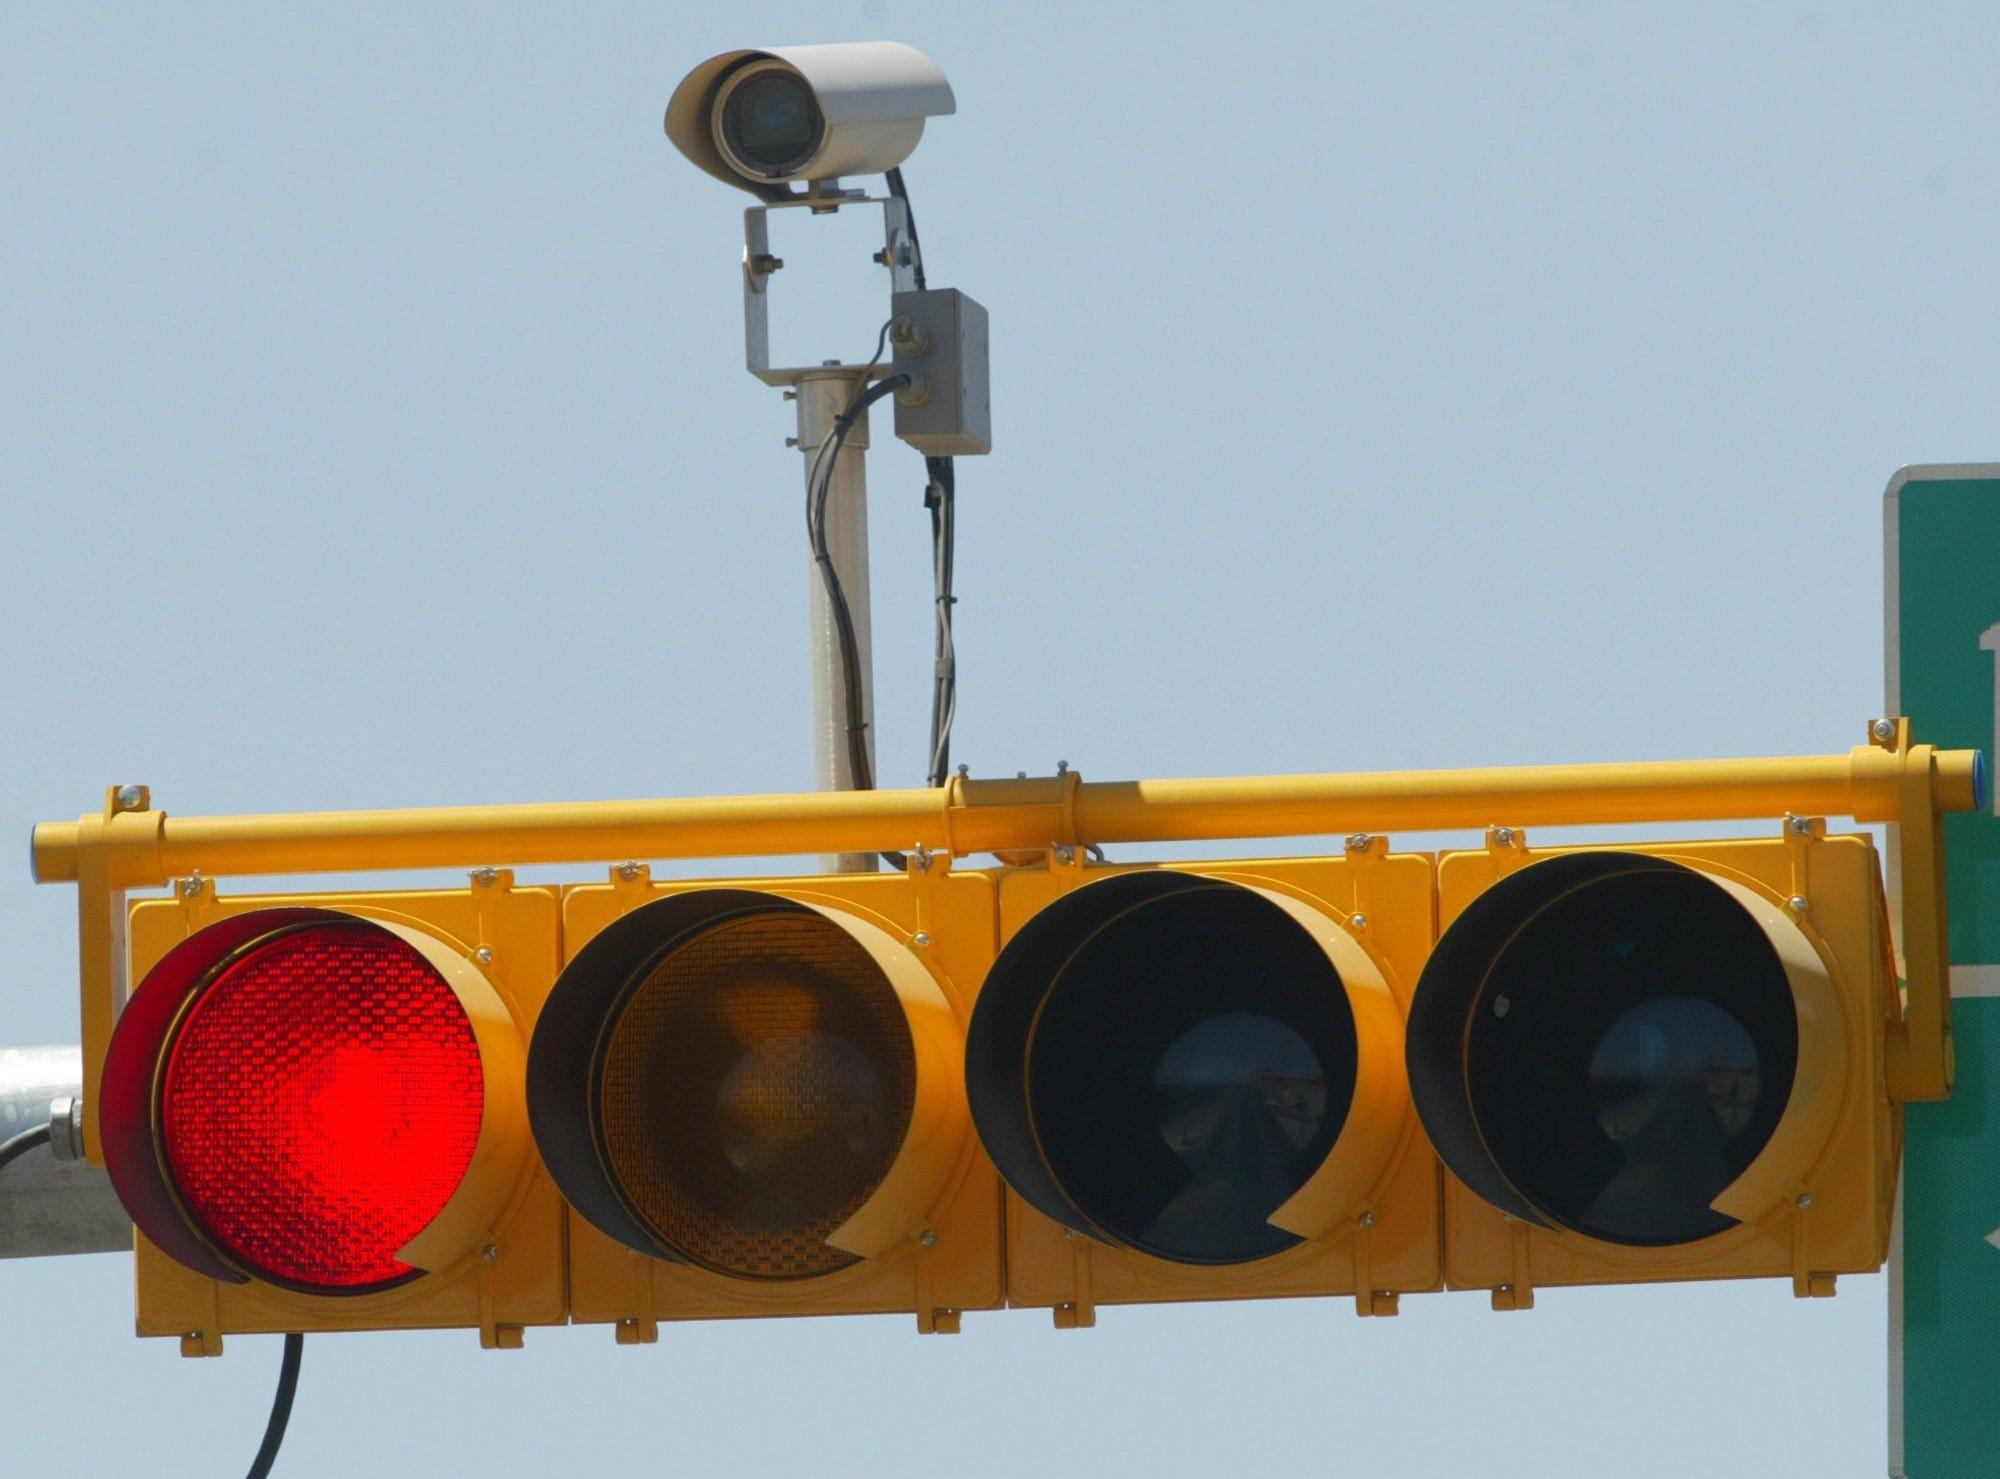 Detail Of Traffic Light Camera. (Photo: Mark Lambie)